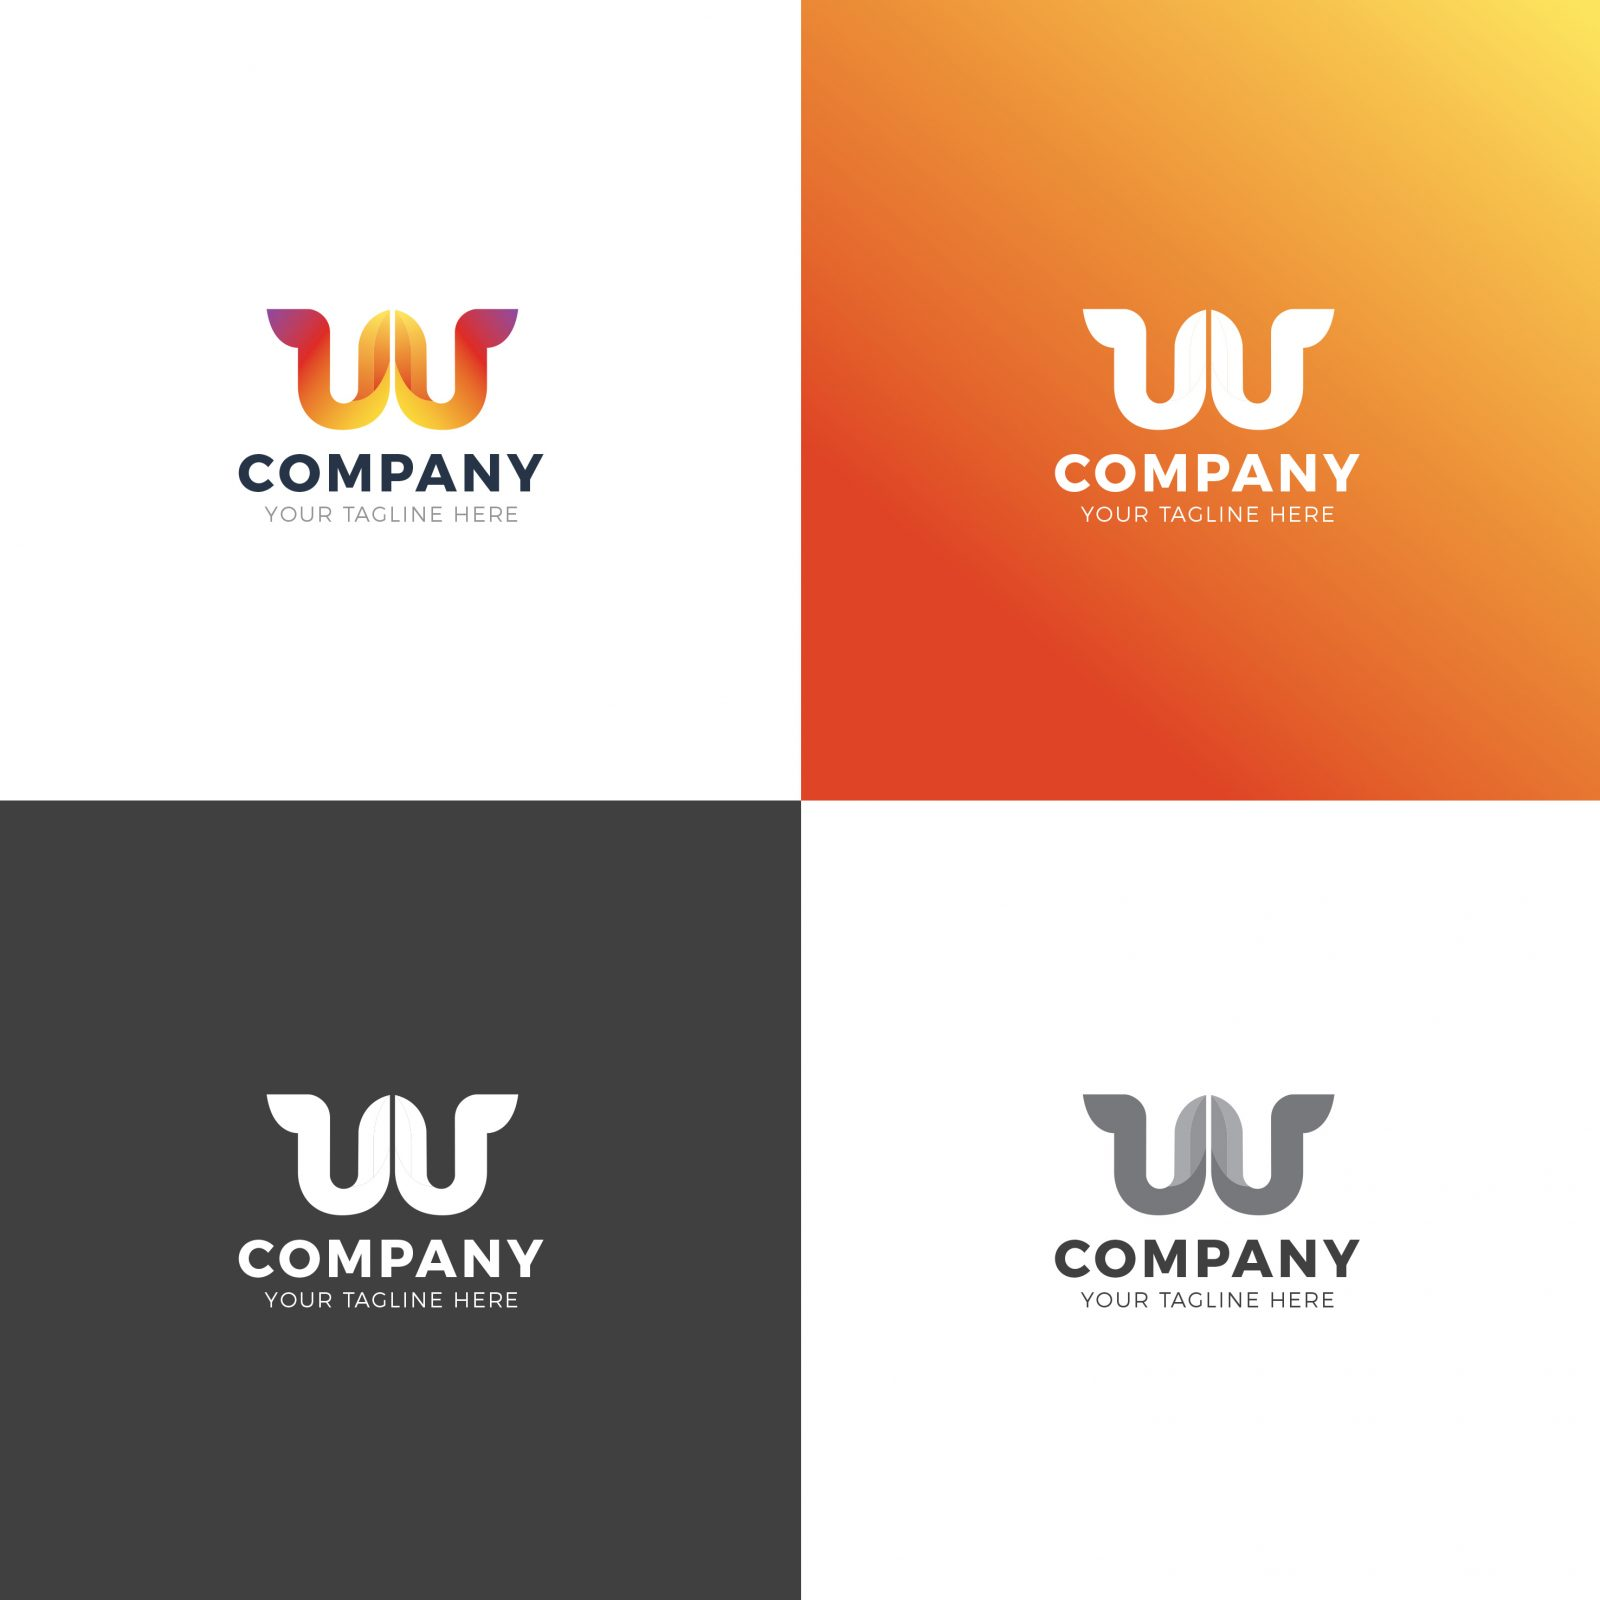 w company professional logo design template 001919